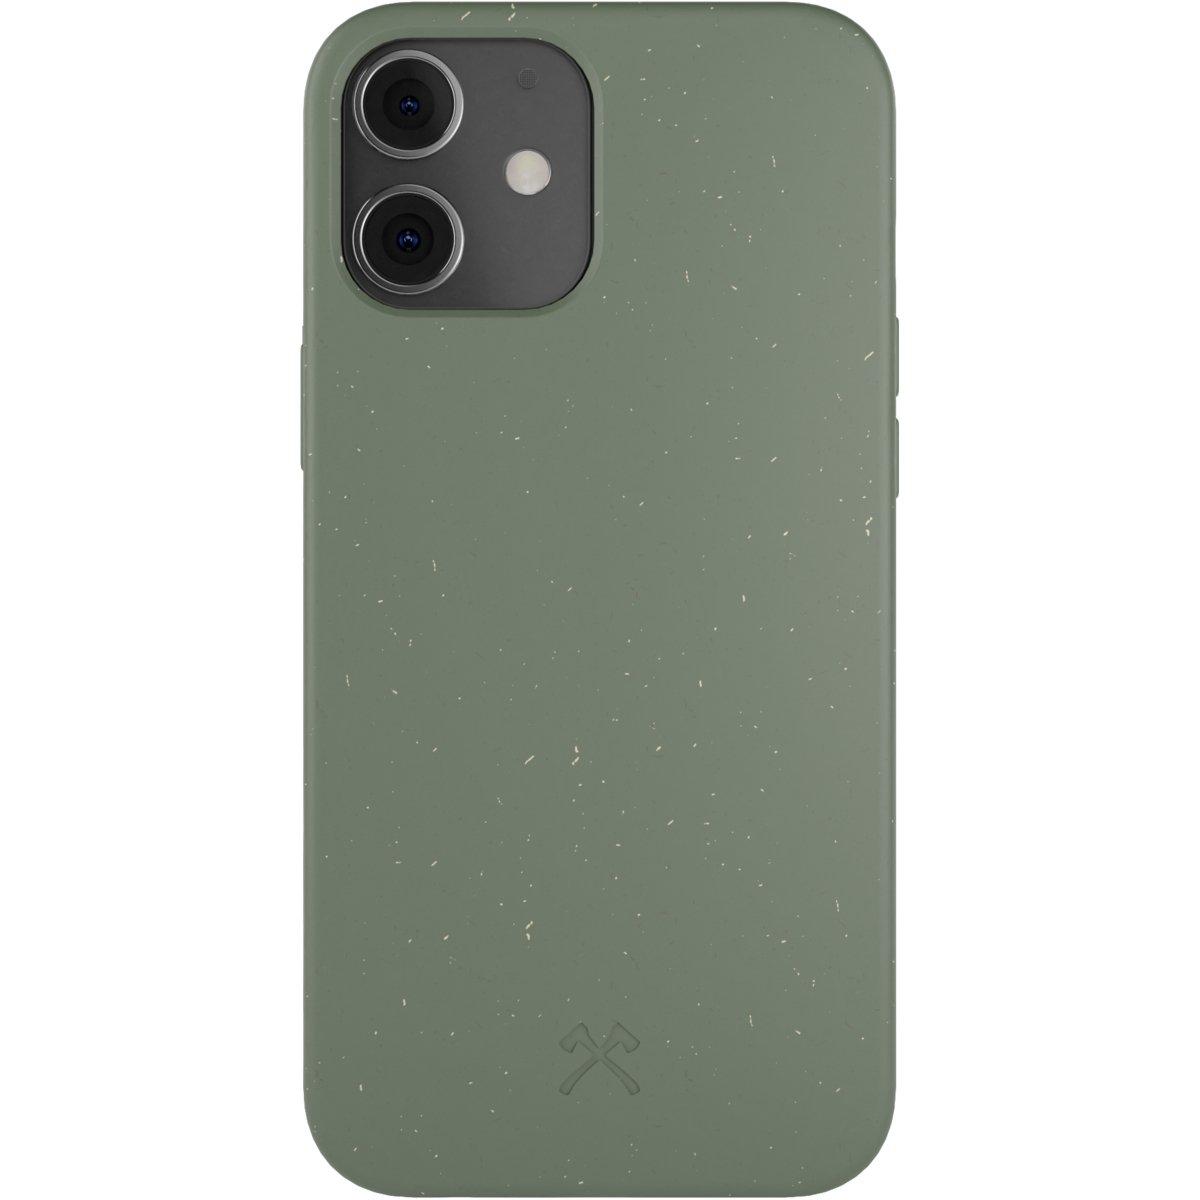 Woodcessories Bio Case AM iPhone 12 Mini - green